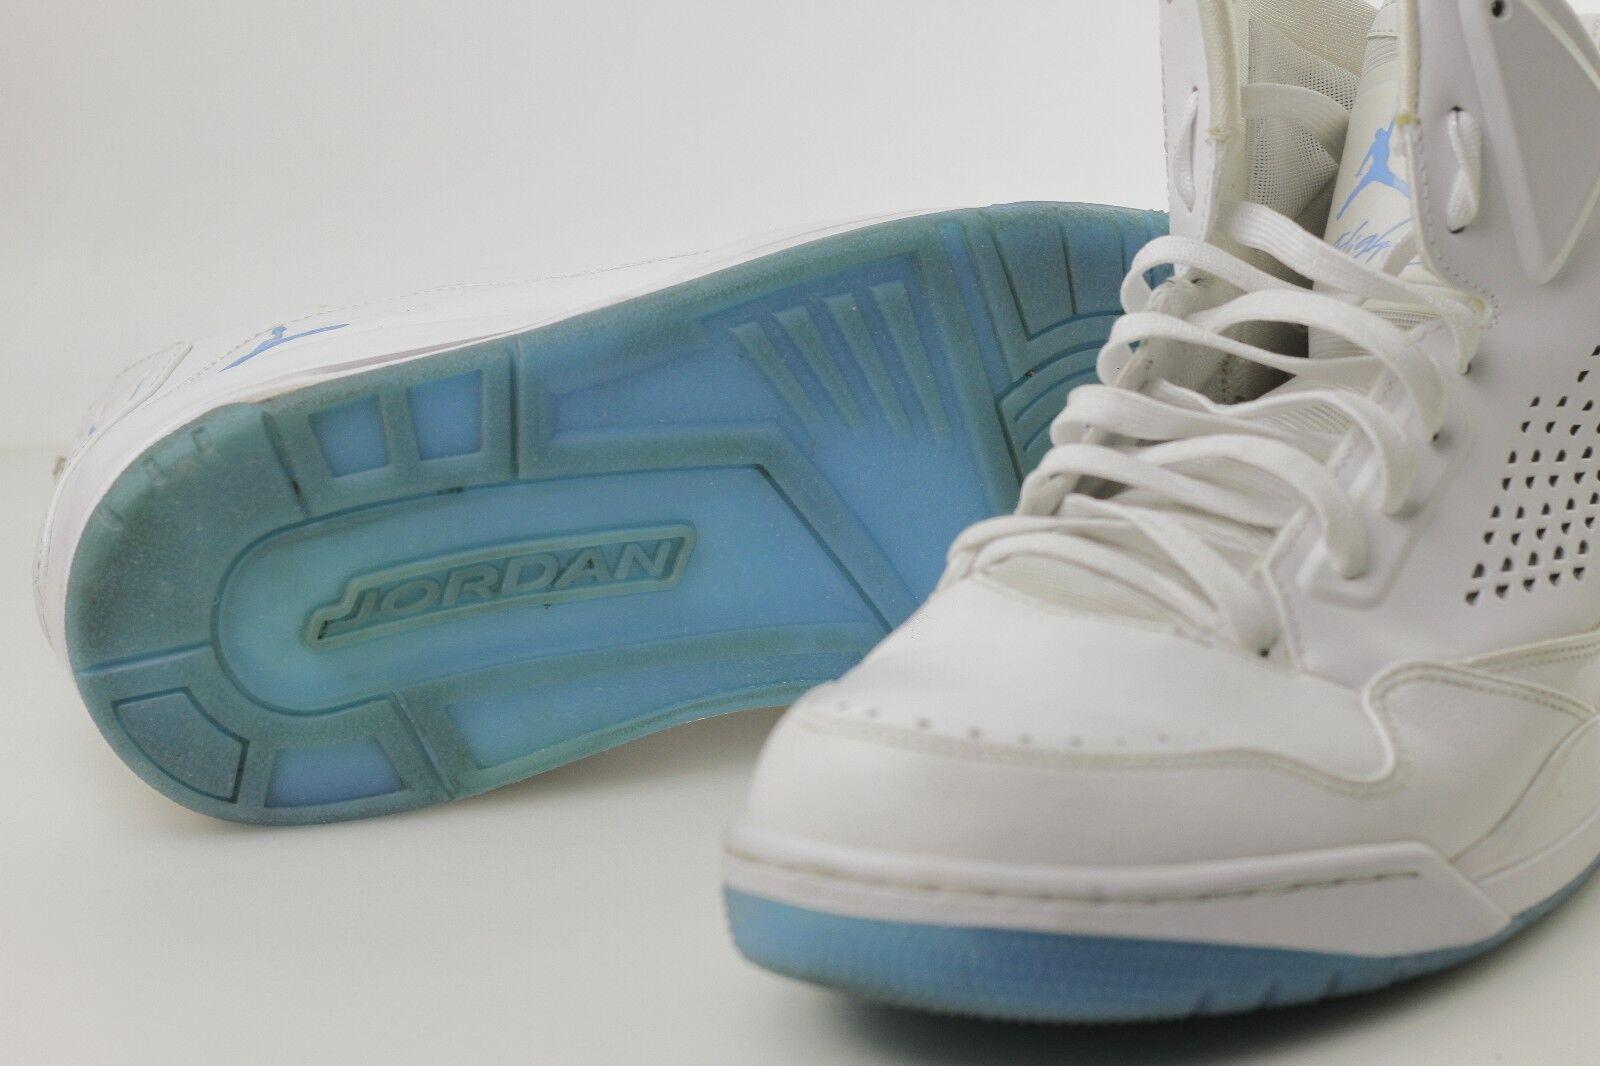 Nike Jordan SC-3 White Powder Blue. Comfortable Special limited time